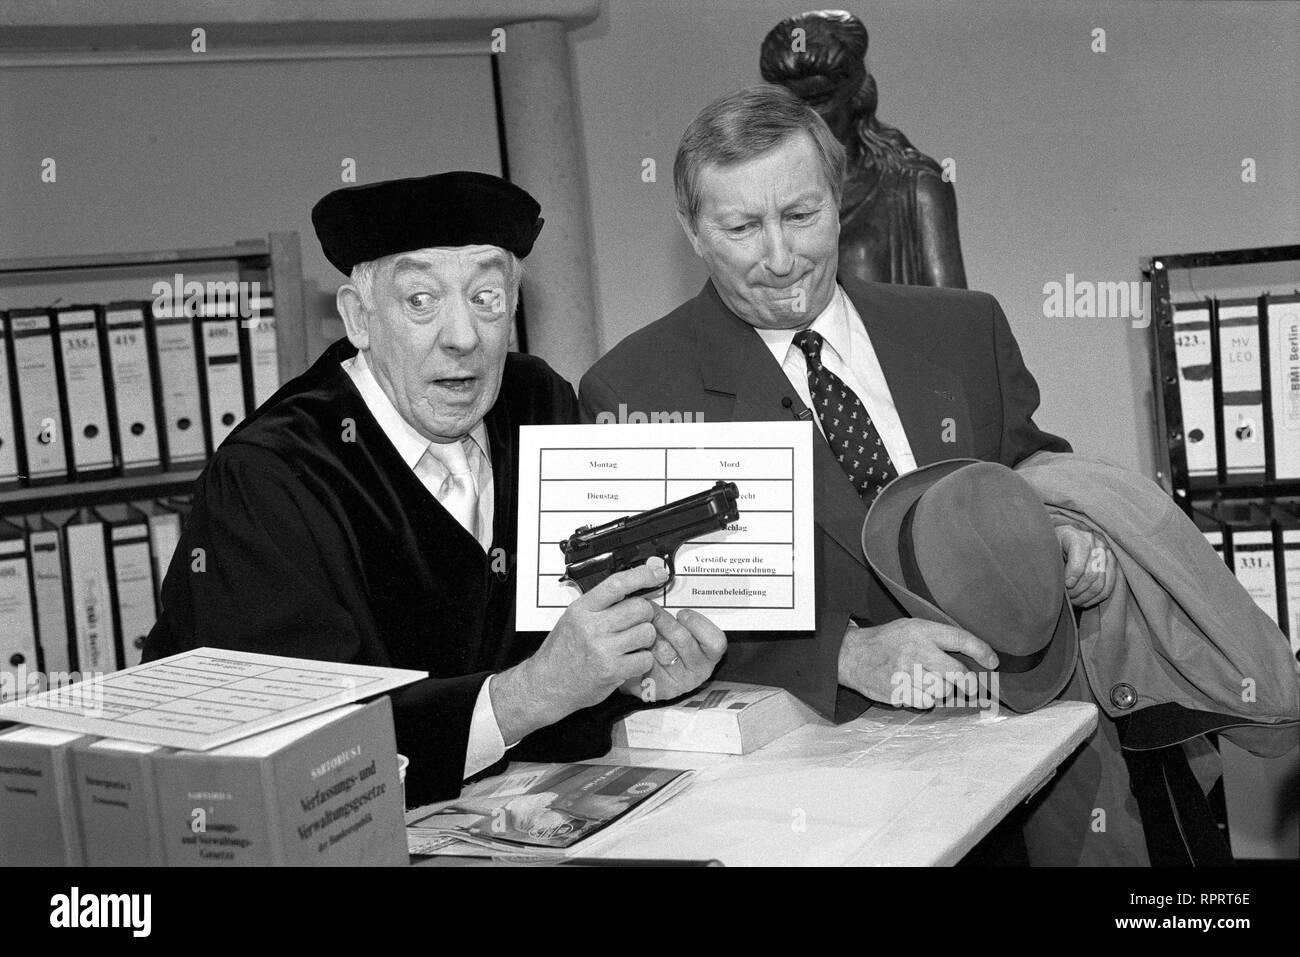 HALLERVORDENS SPOTT-LIGHT / 'Schlanke Justiz' - DIETER HALLERVORDEN, WILFRIED HERBST / Überschrift: HALLERVORDENS SPOTT-LIGHT Stock Photo